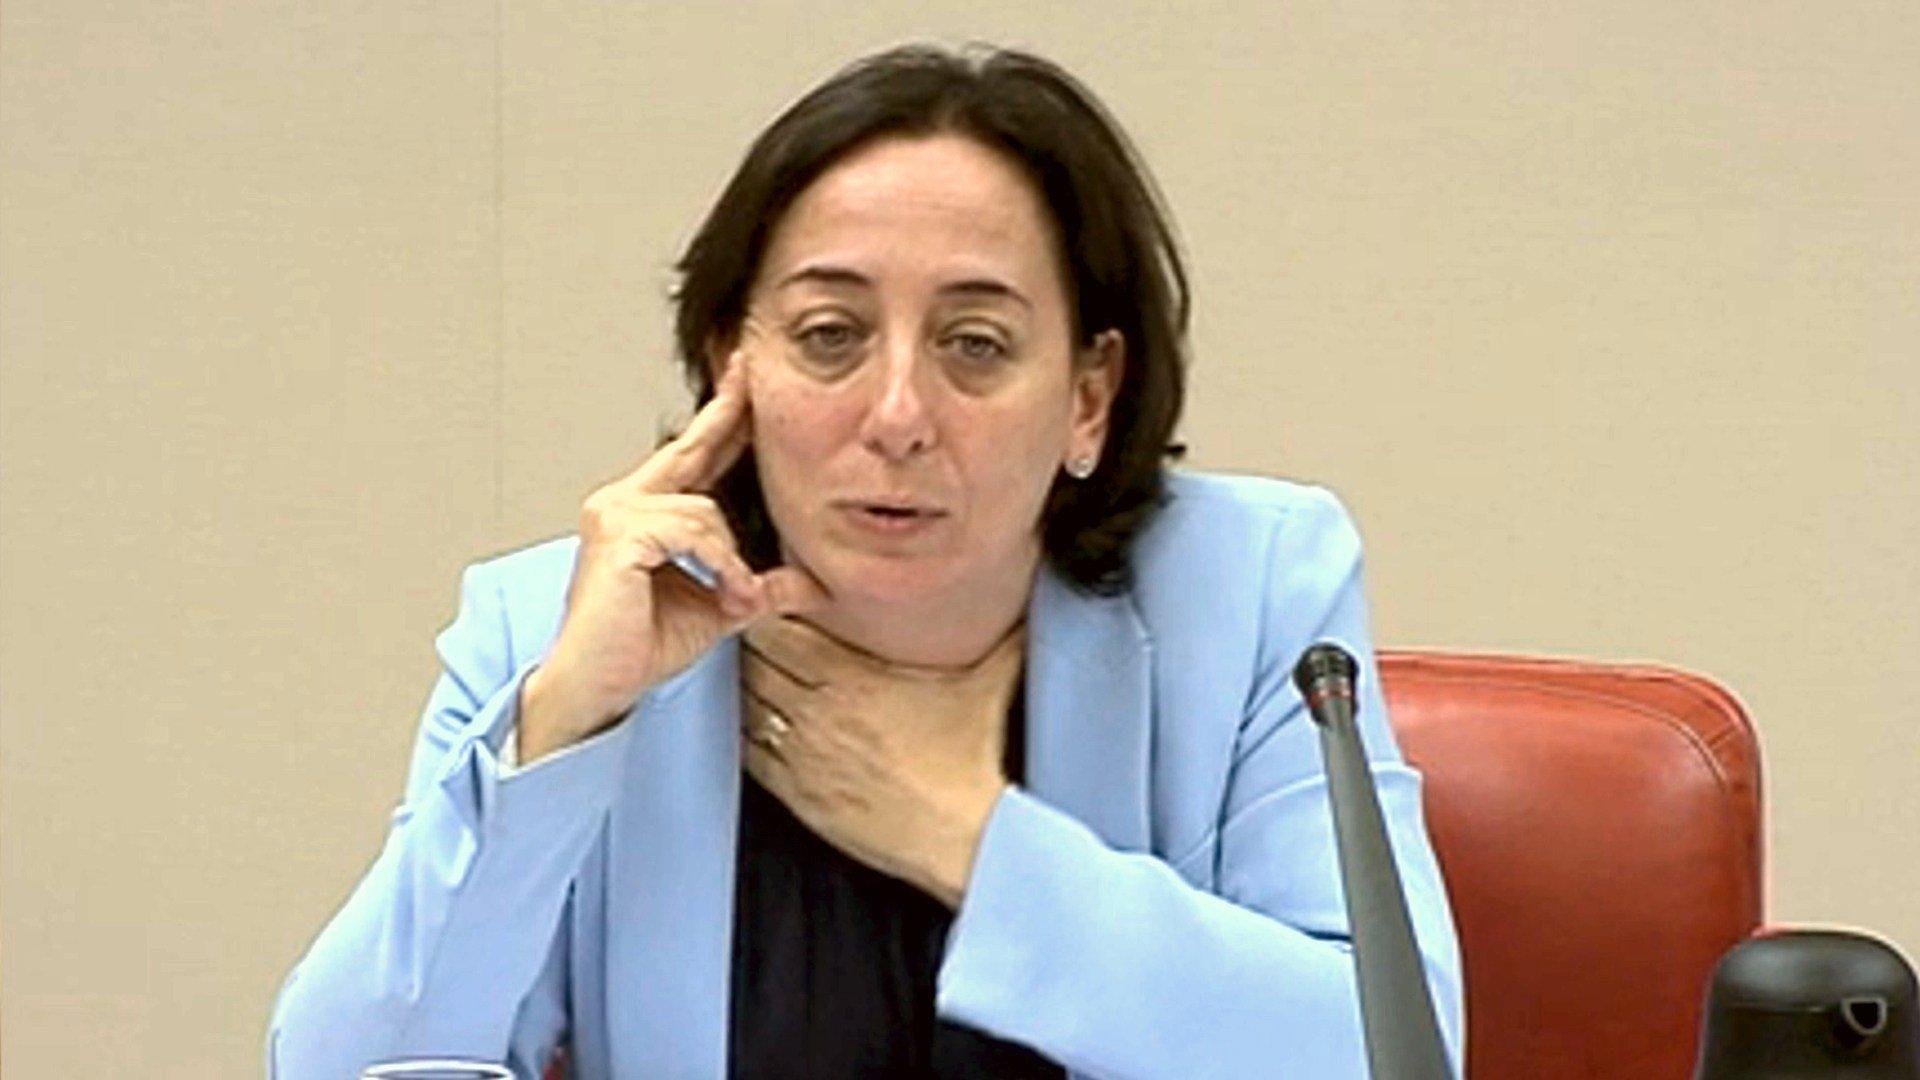 Carmen Rodríguez-Medel